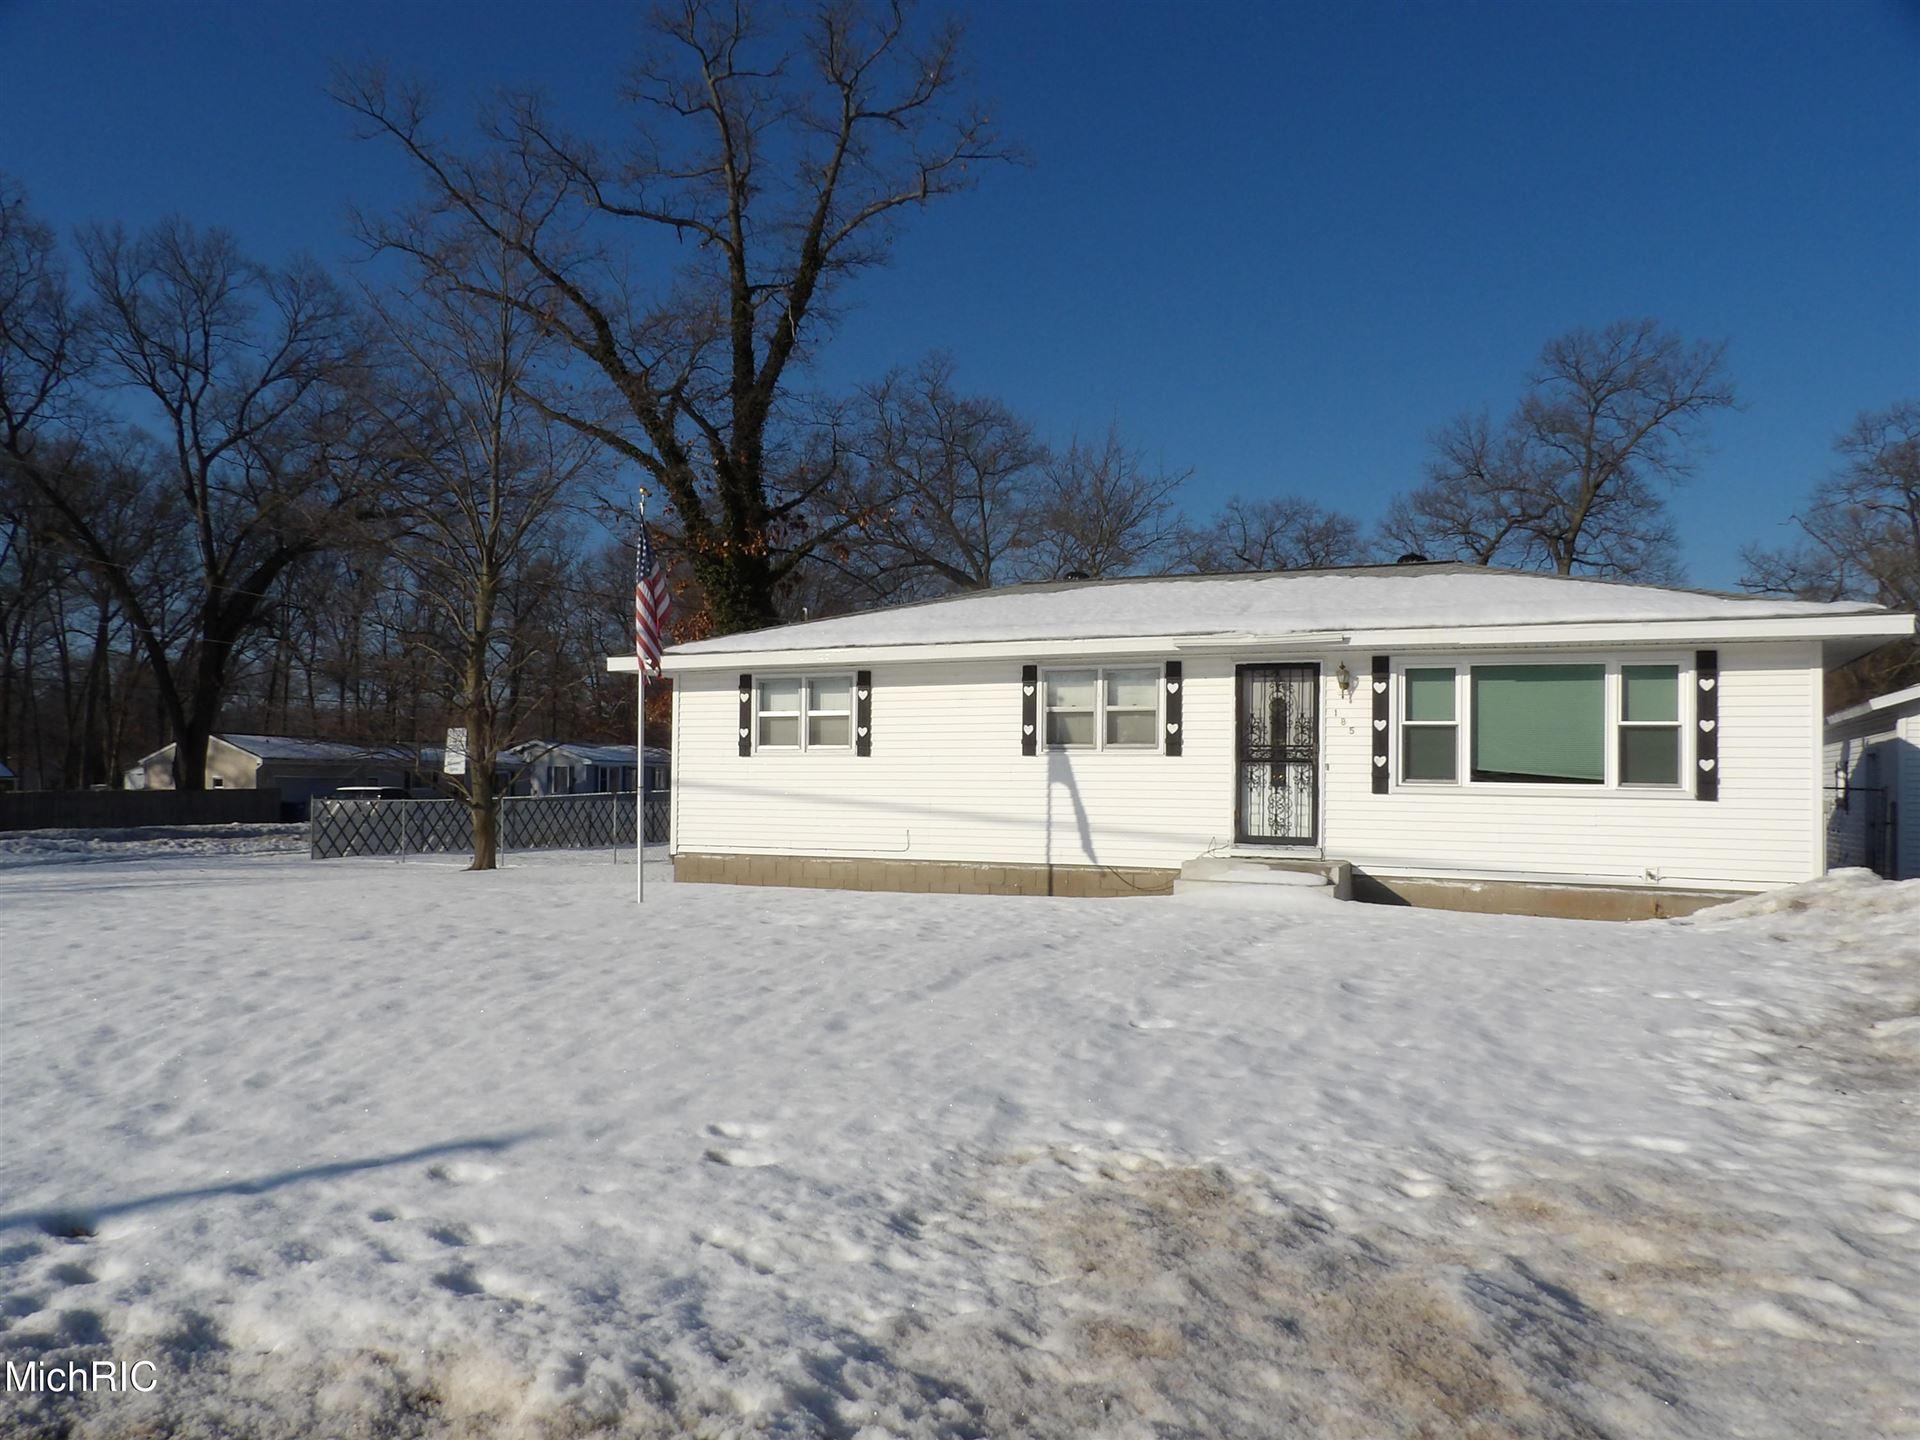 Photo of 185 S Brooks Road, Muskegon, MI 49442 (MLS # 21006030)